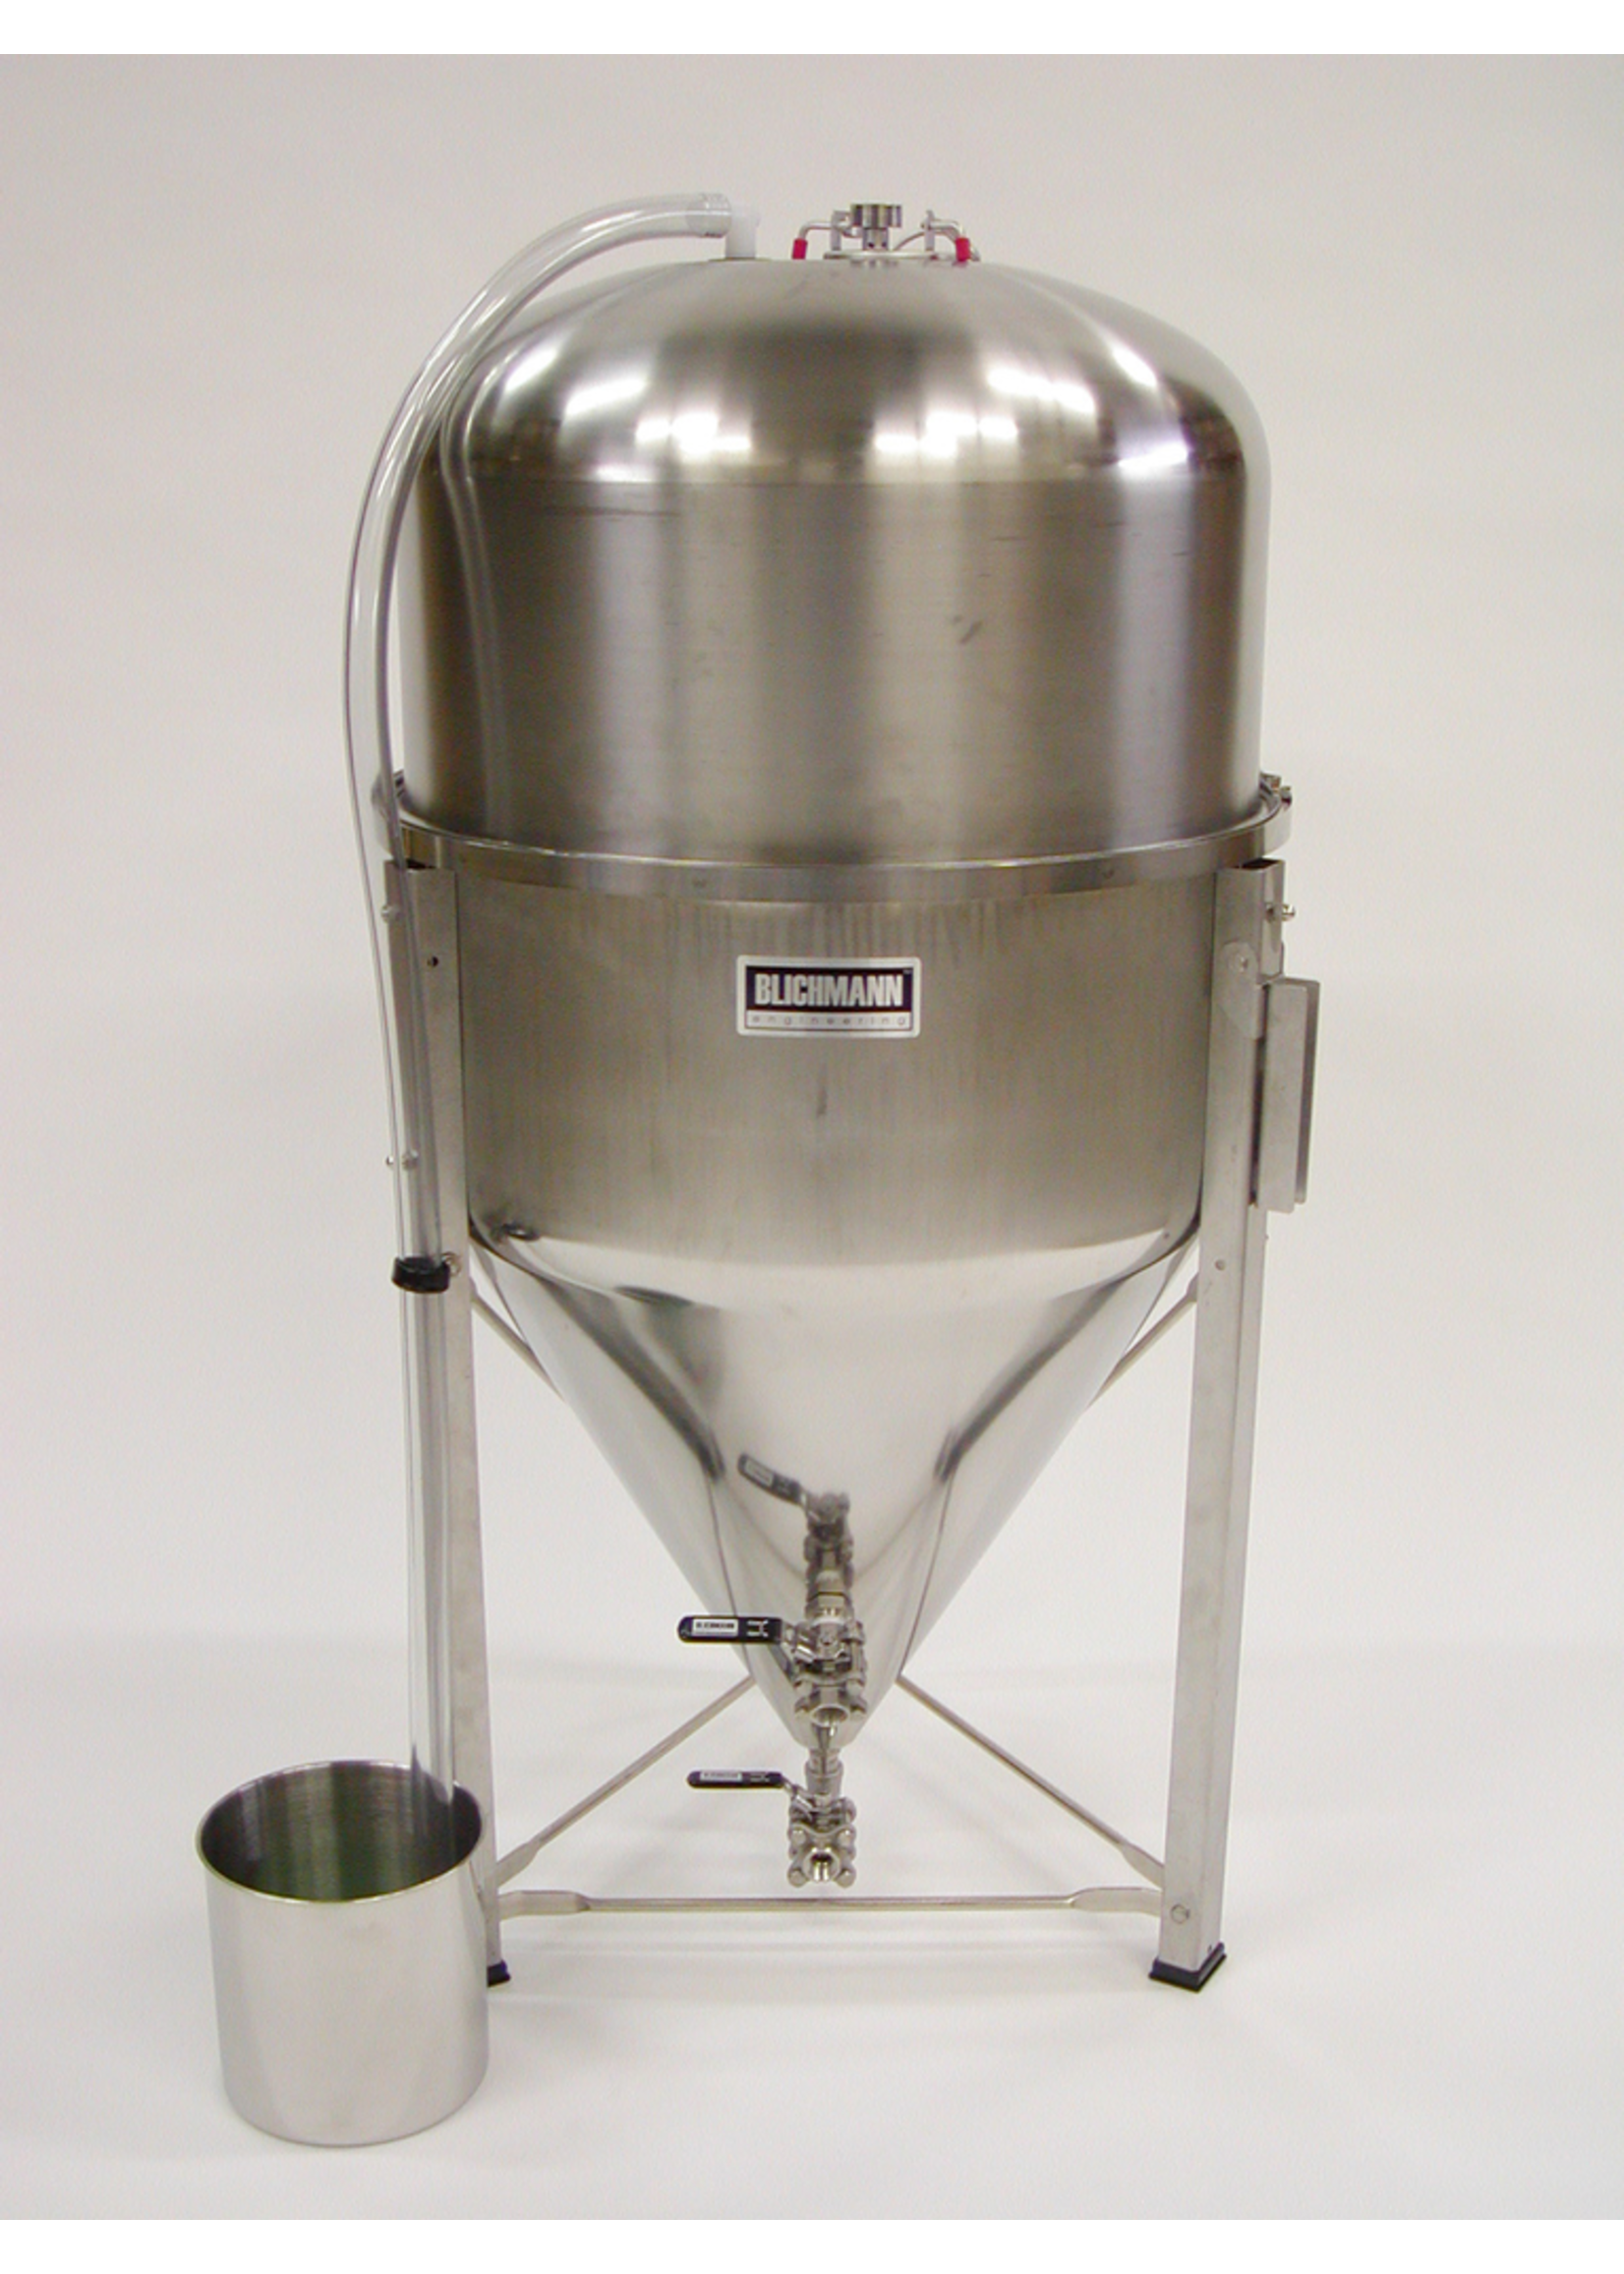 Blichmann Blichmann Fermenator - Conical Fermentor - 42 Gallon with NPT Fittings